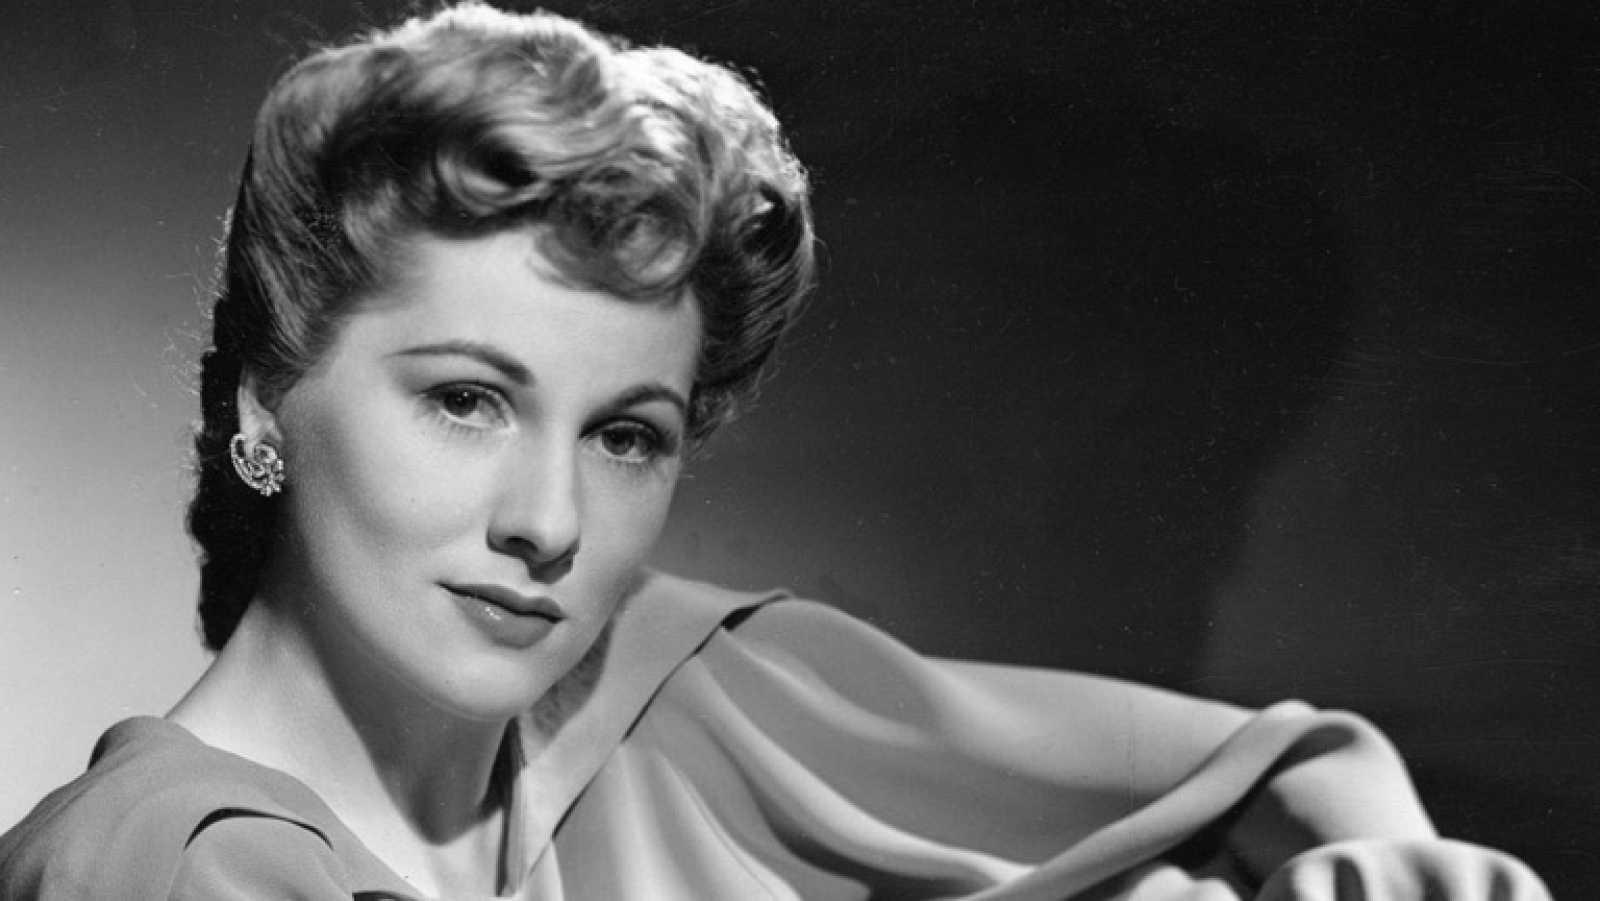 Días de cine: Adiós a Joan Fontaine (1917-2013)